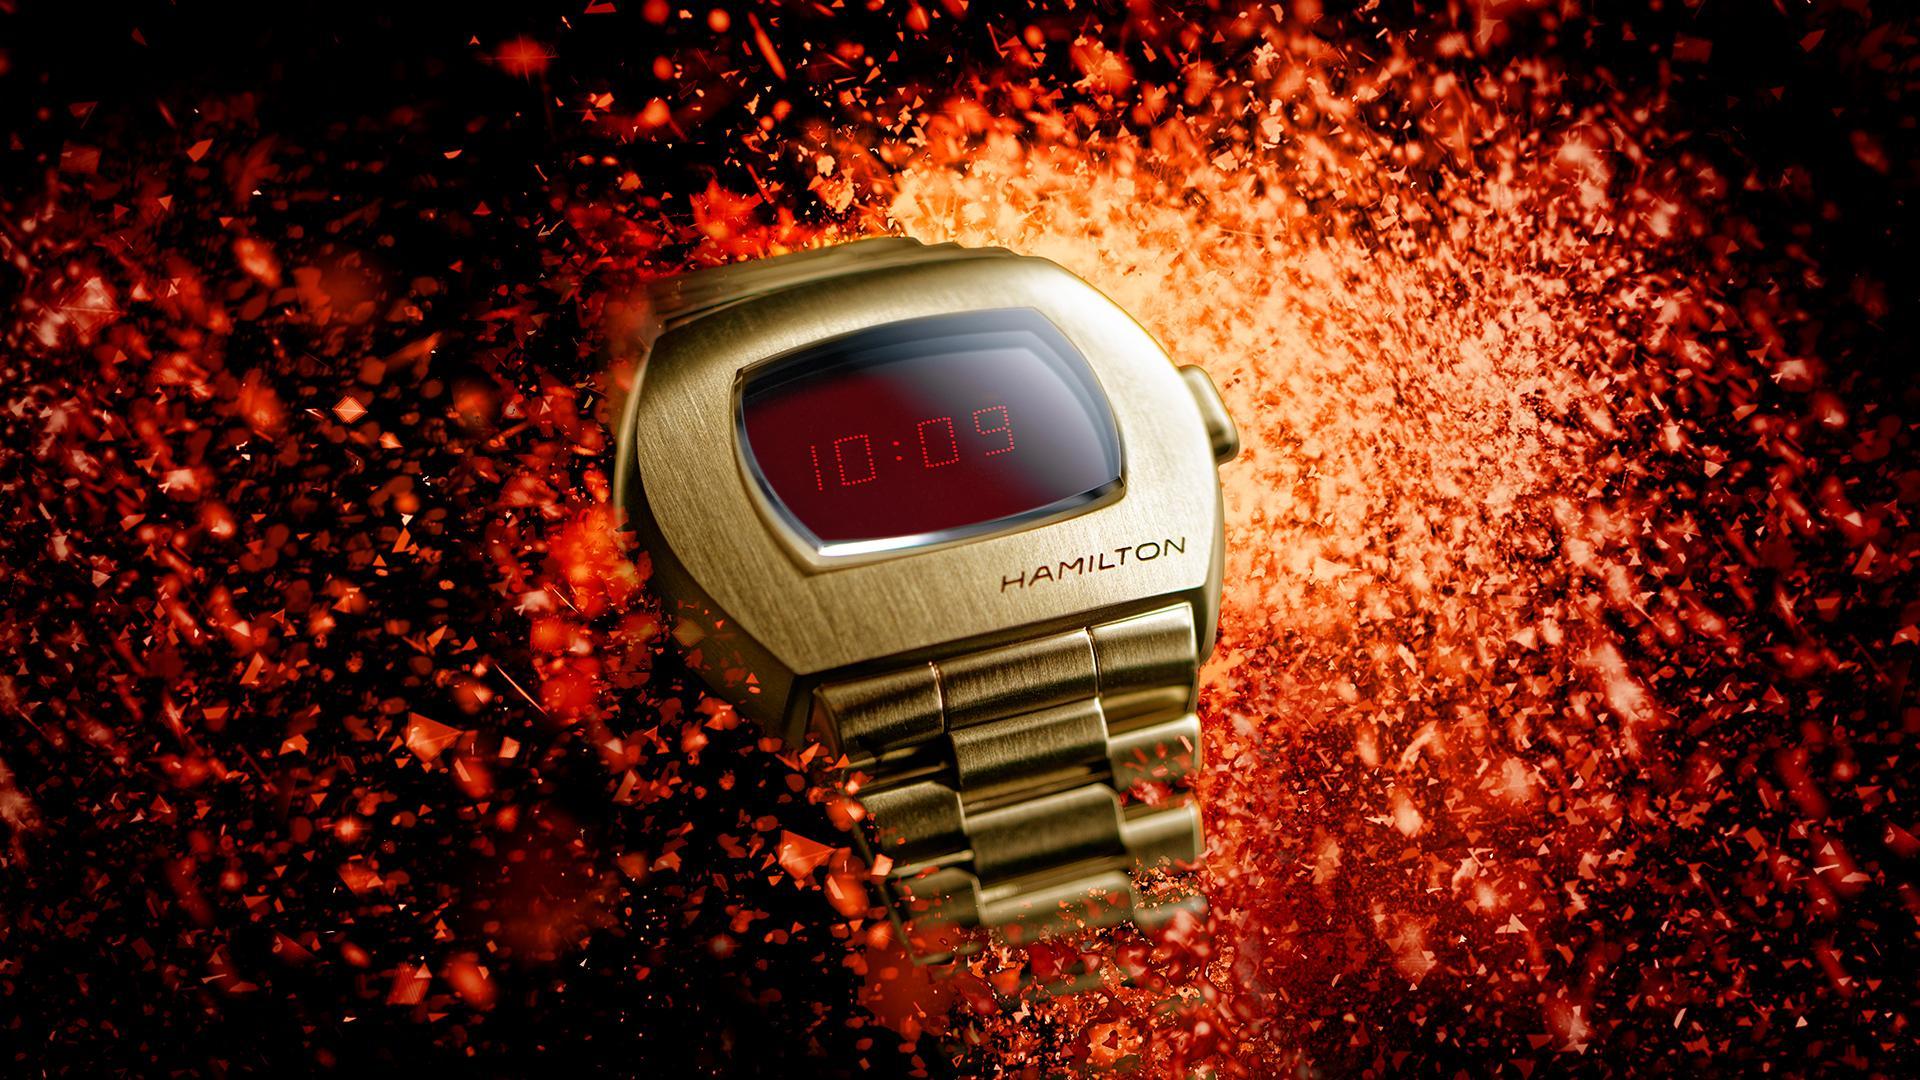 Hamilton PSR watch